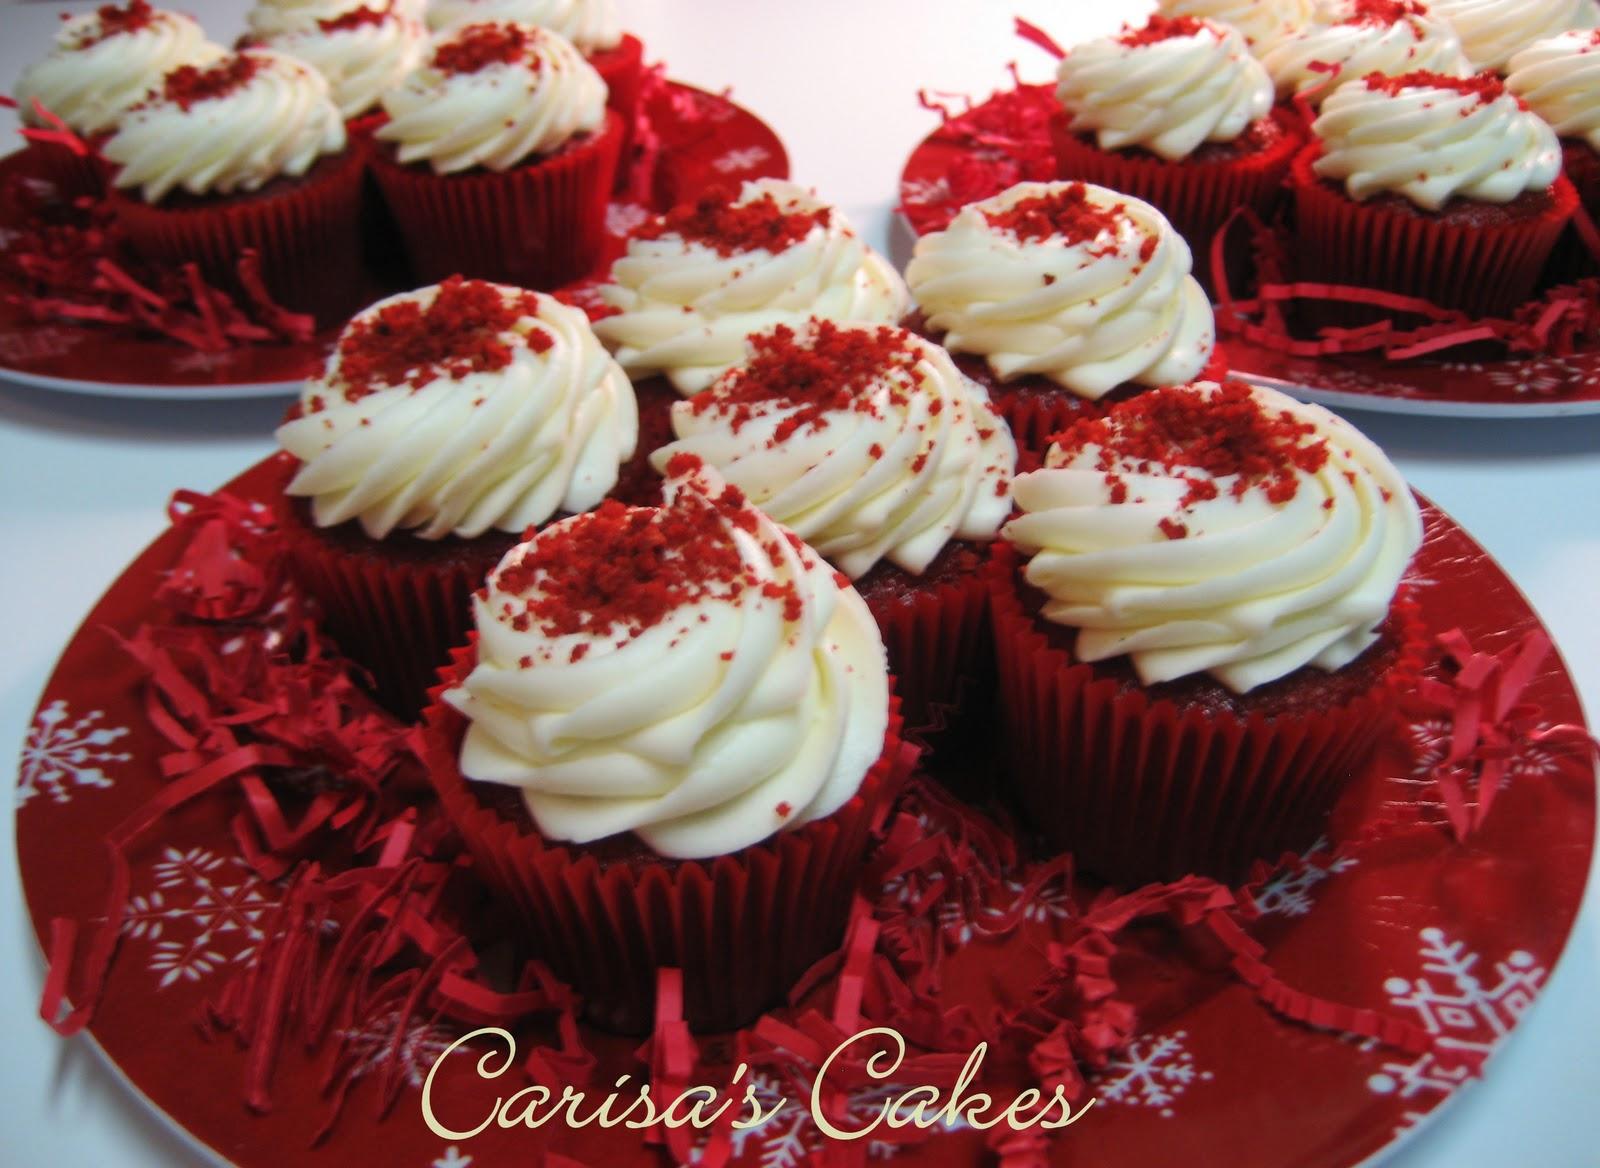 Carisa's Cakes: Red Velvet Cupcakes